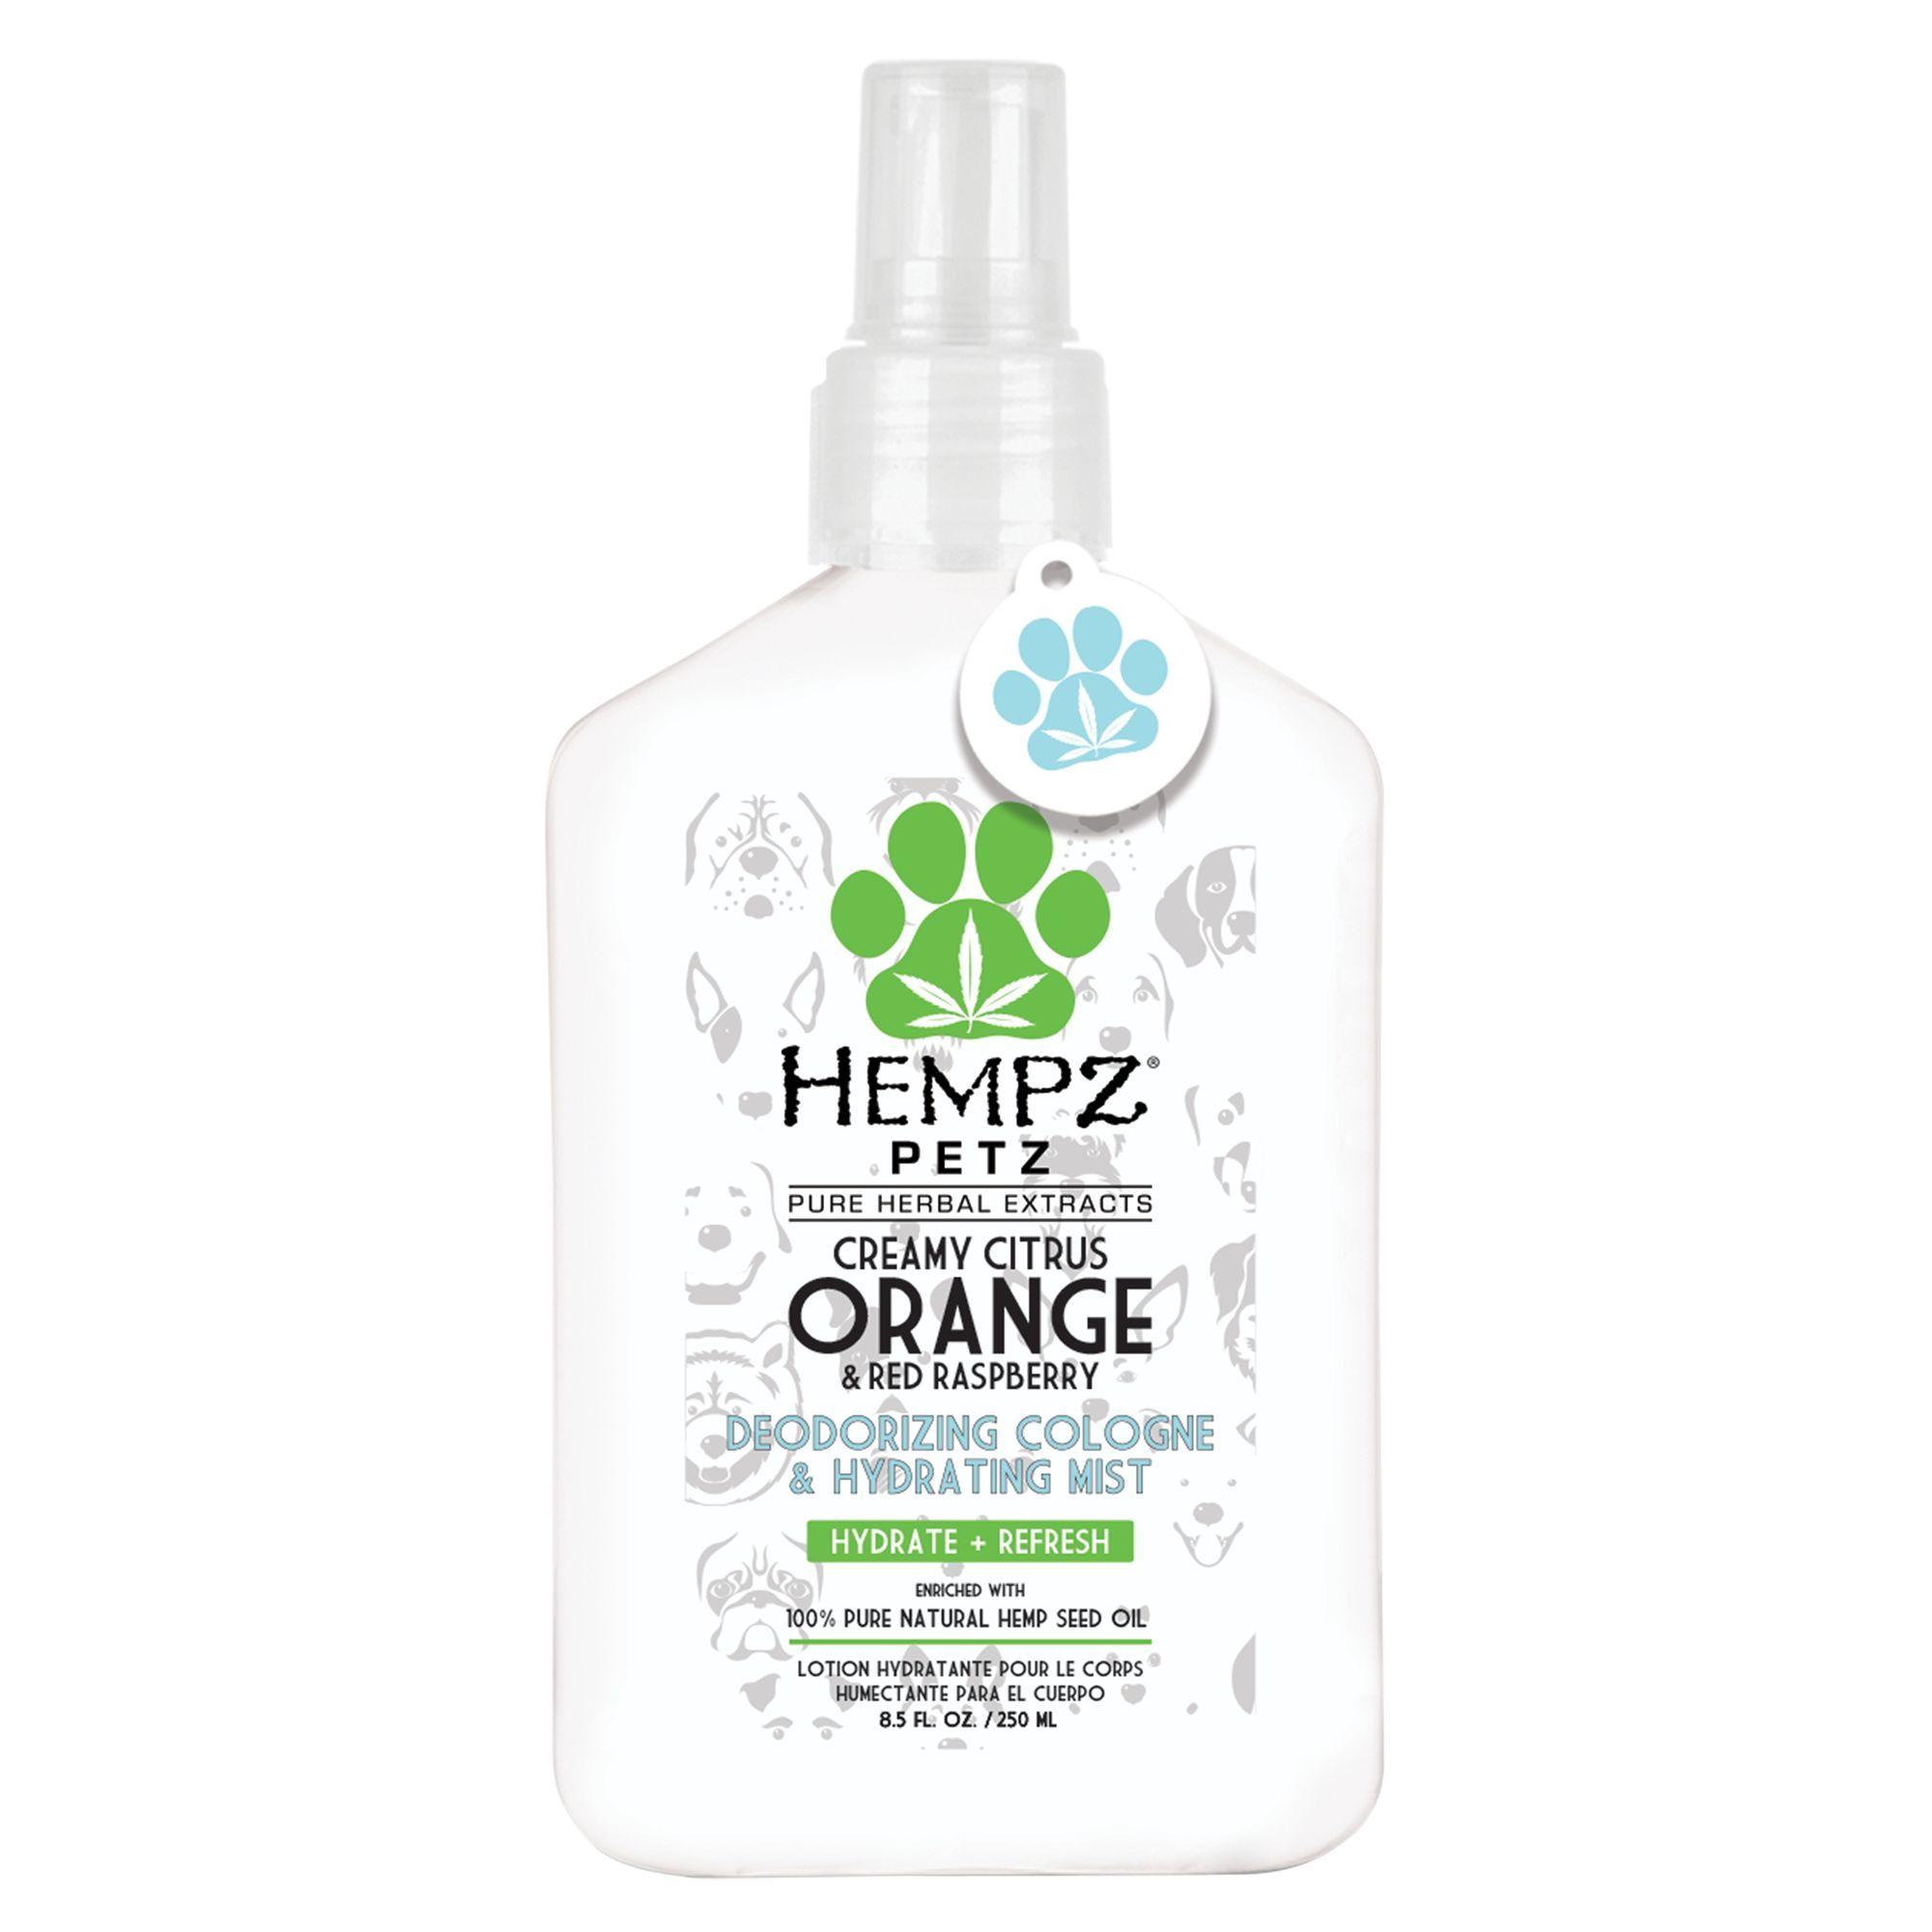 Hempz® Petz Herbal Deodorizing Cologne & Hydrating Mist - Creamy Citrus Orange & Red Raspberry